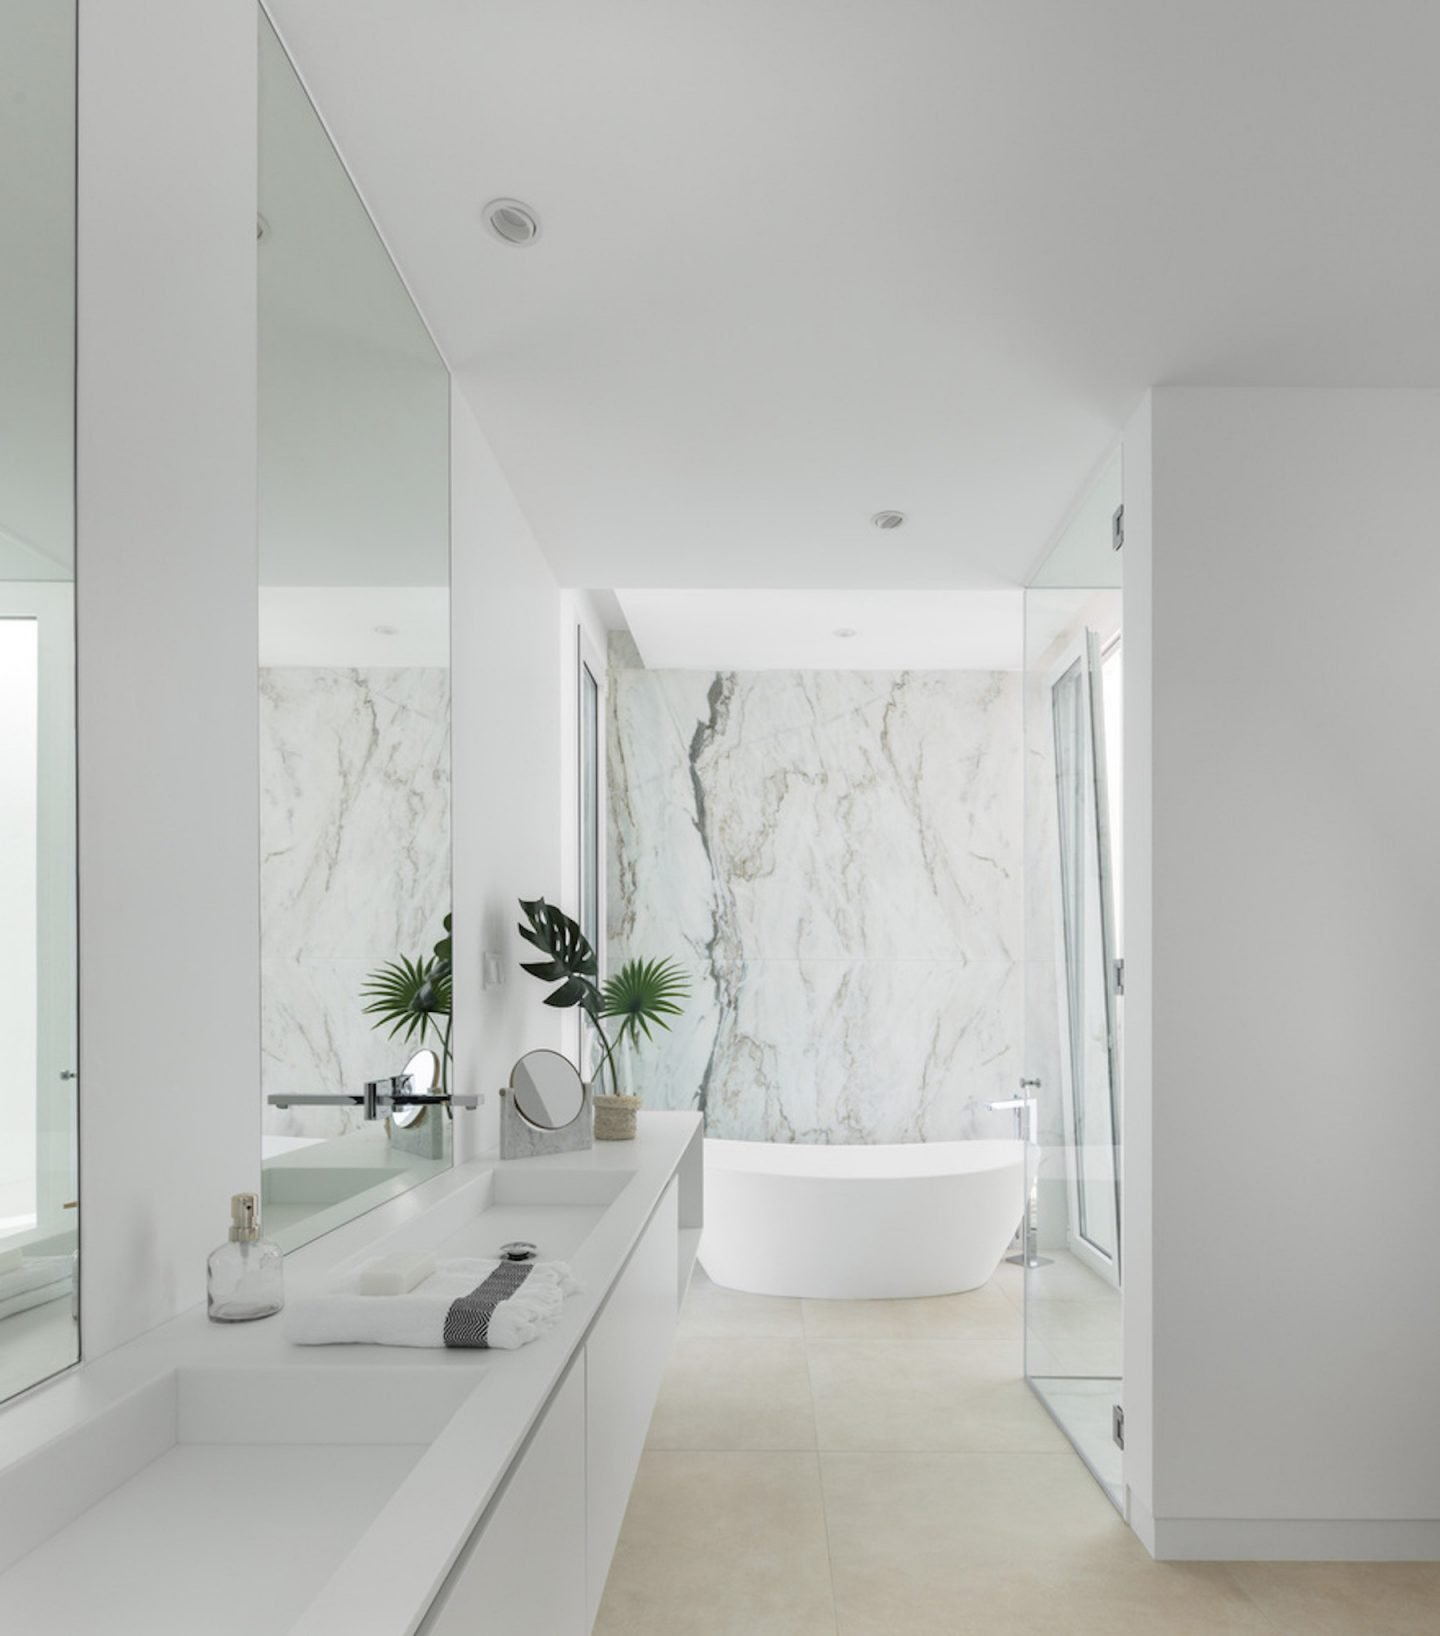 iGNANT-Architecture-Mário-Martins-Atelier-Casa-Carrara-08